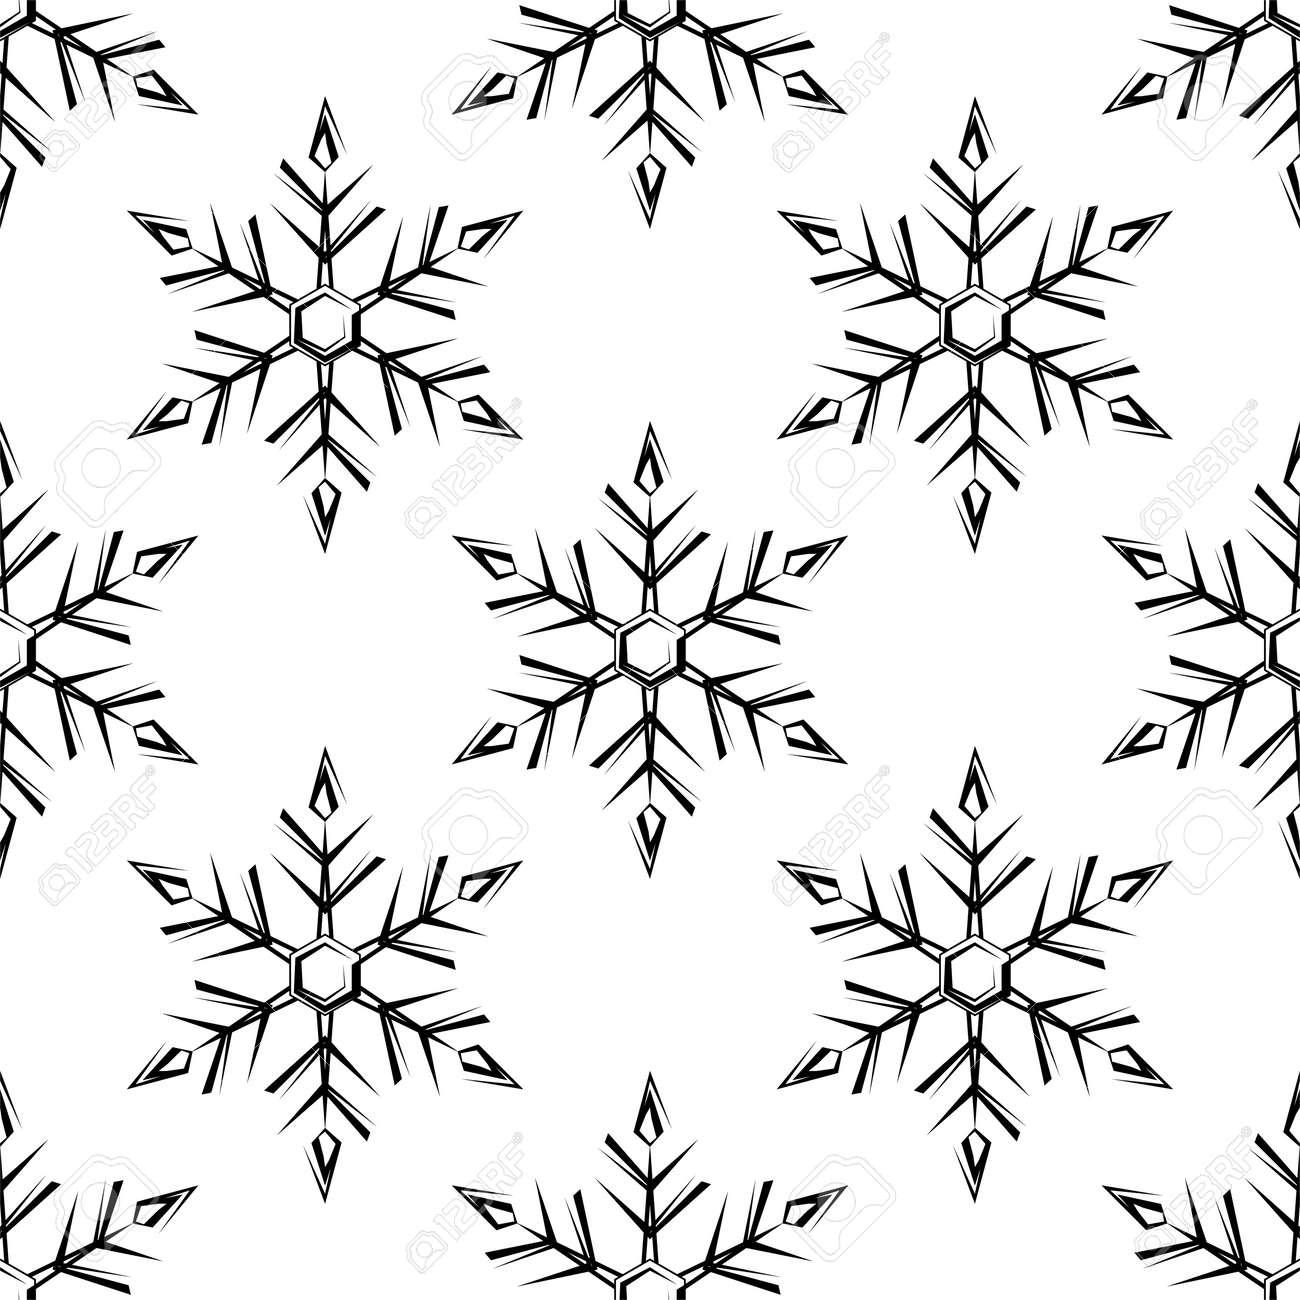 Snowflake, Snow, Ice Crystal Shape Seamless Pattern Vector Art Illustration - 149571110